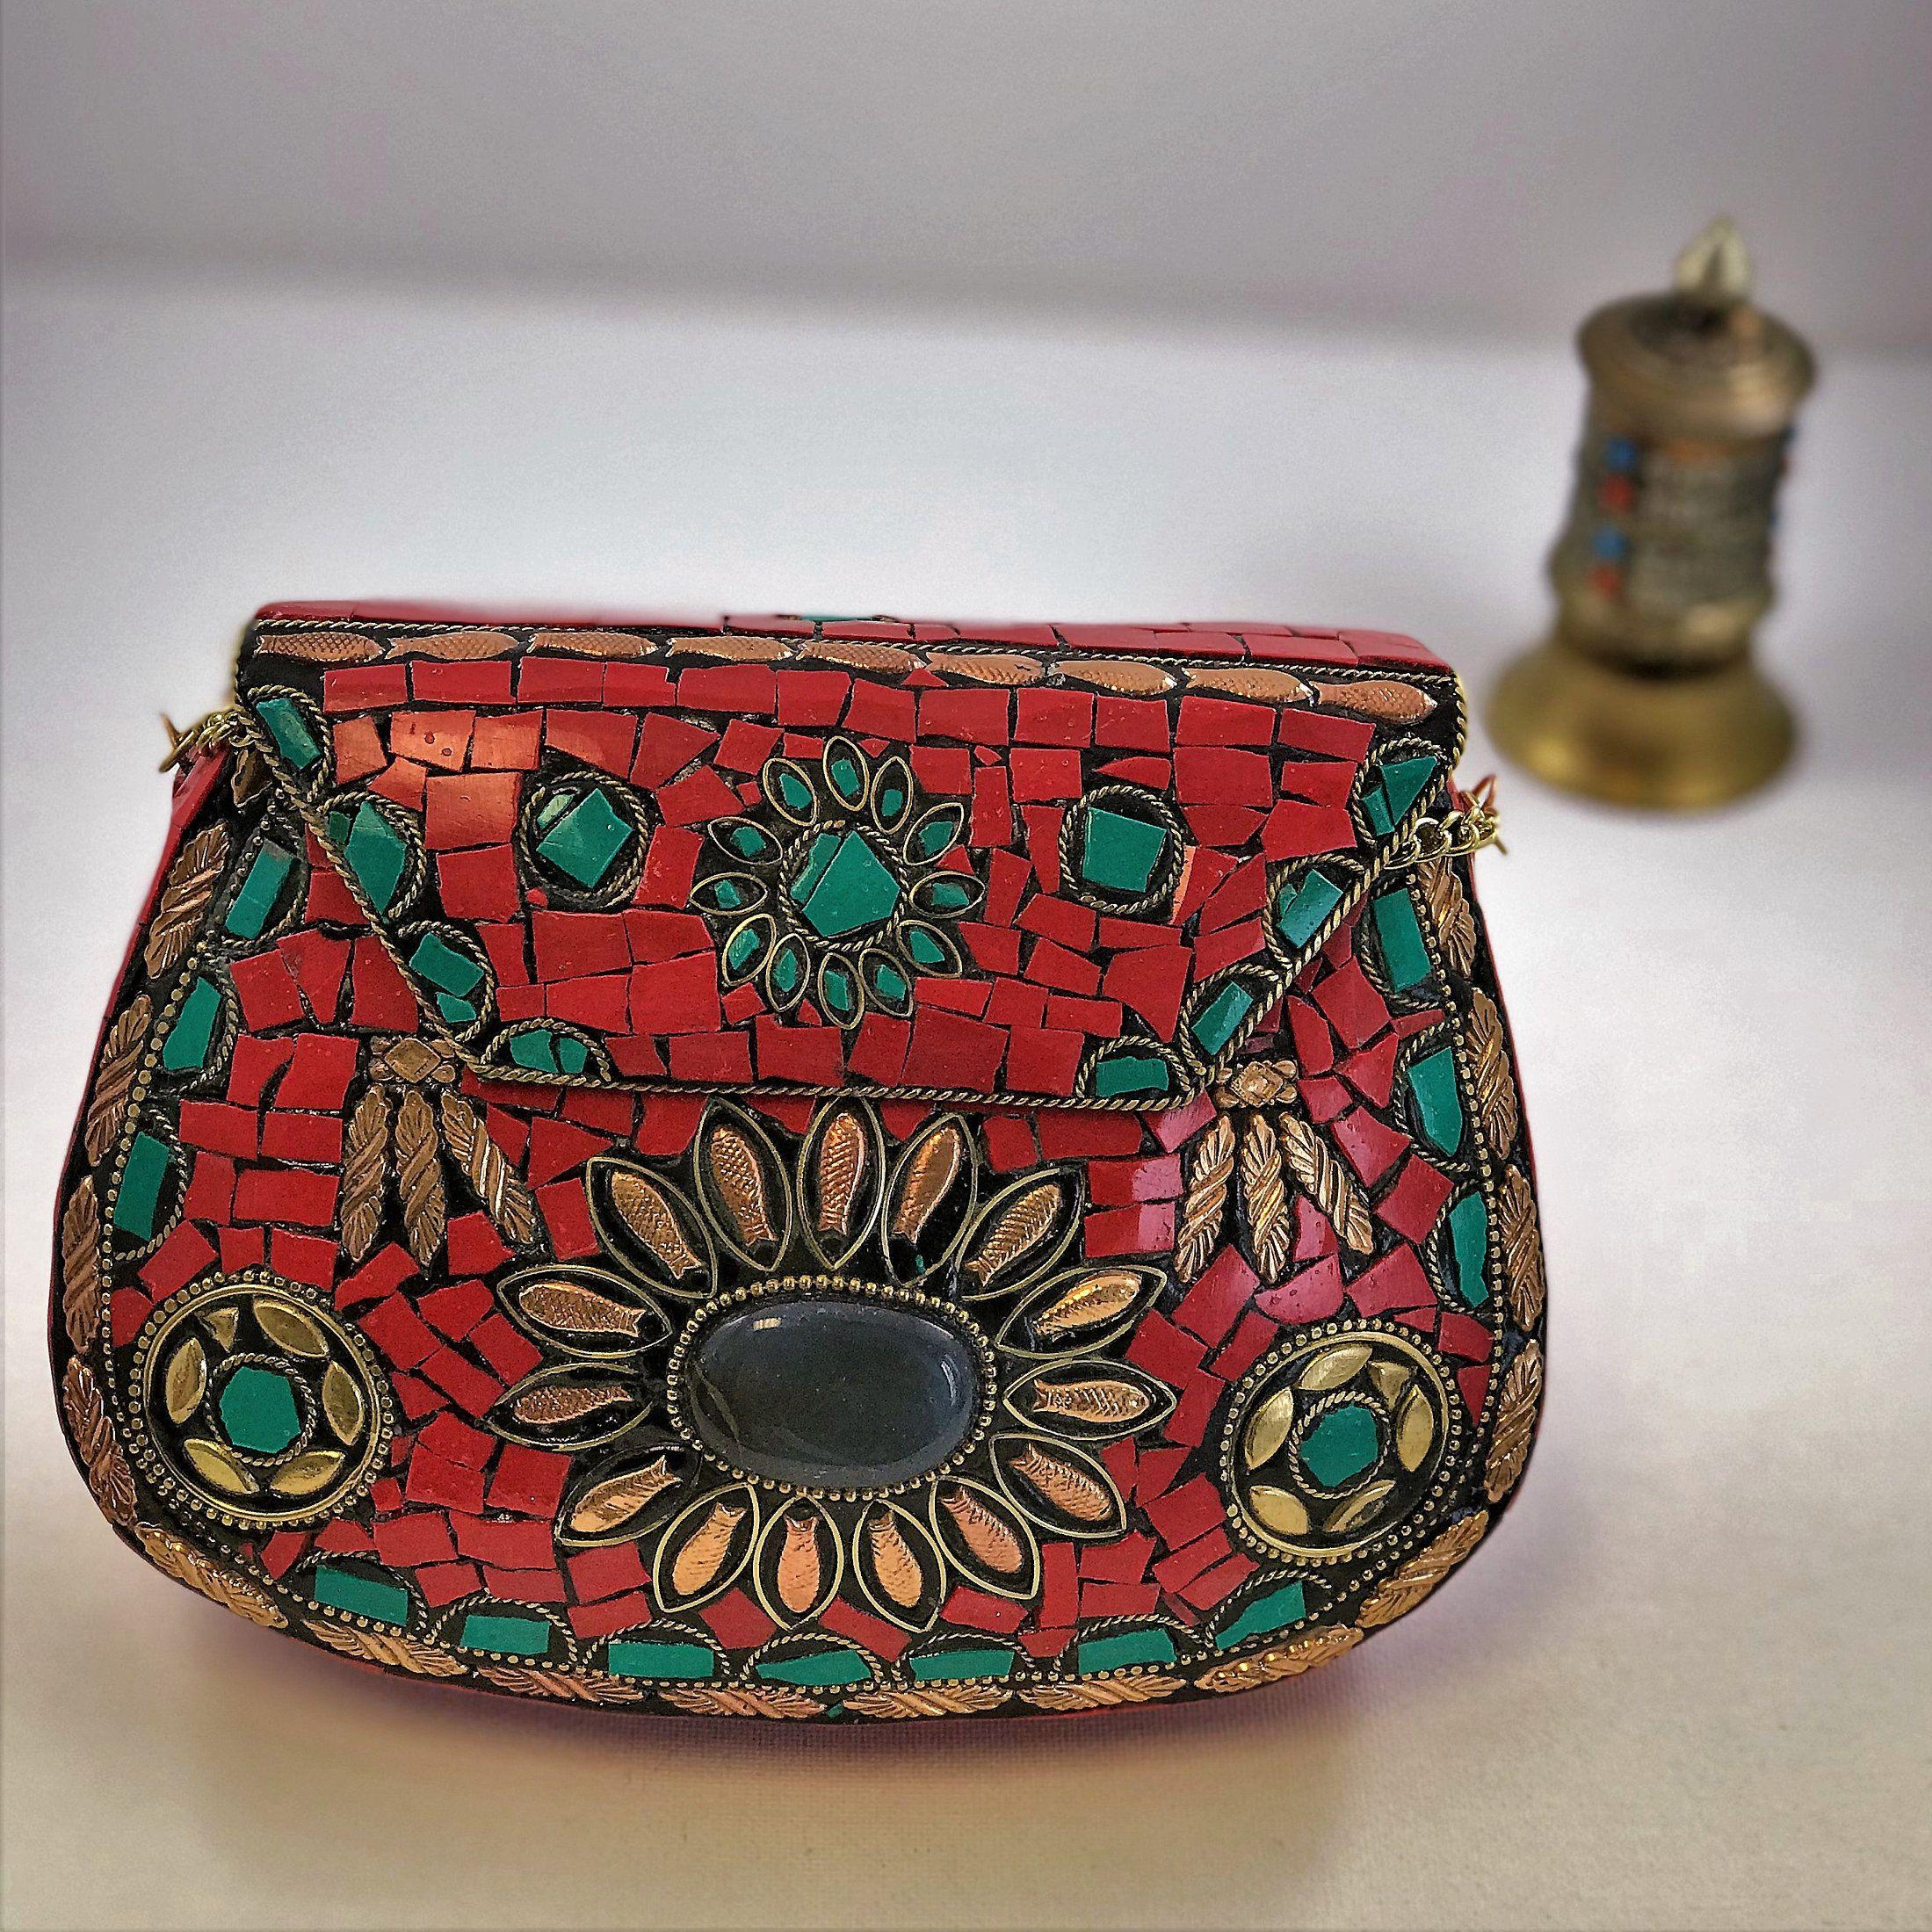 17de1f890e52e Beautiful Kuchi #Clutch Metal Bag. #Ethnic Clutch. Tribal Bag. Clutch Bag. # Metal #Bag. #Evening #Clutch #purse. #bagsandpurses #clutch ...